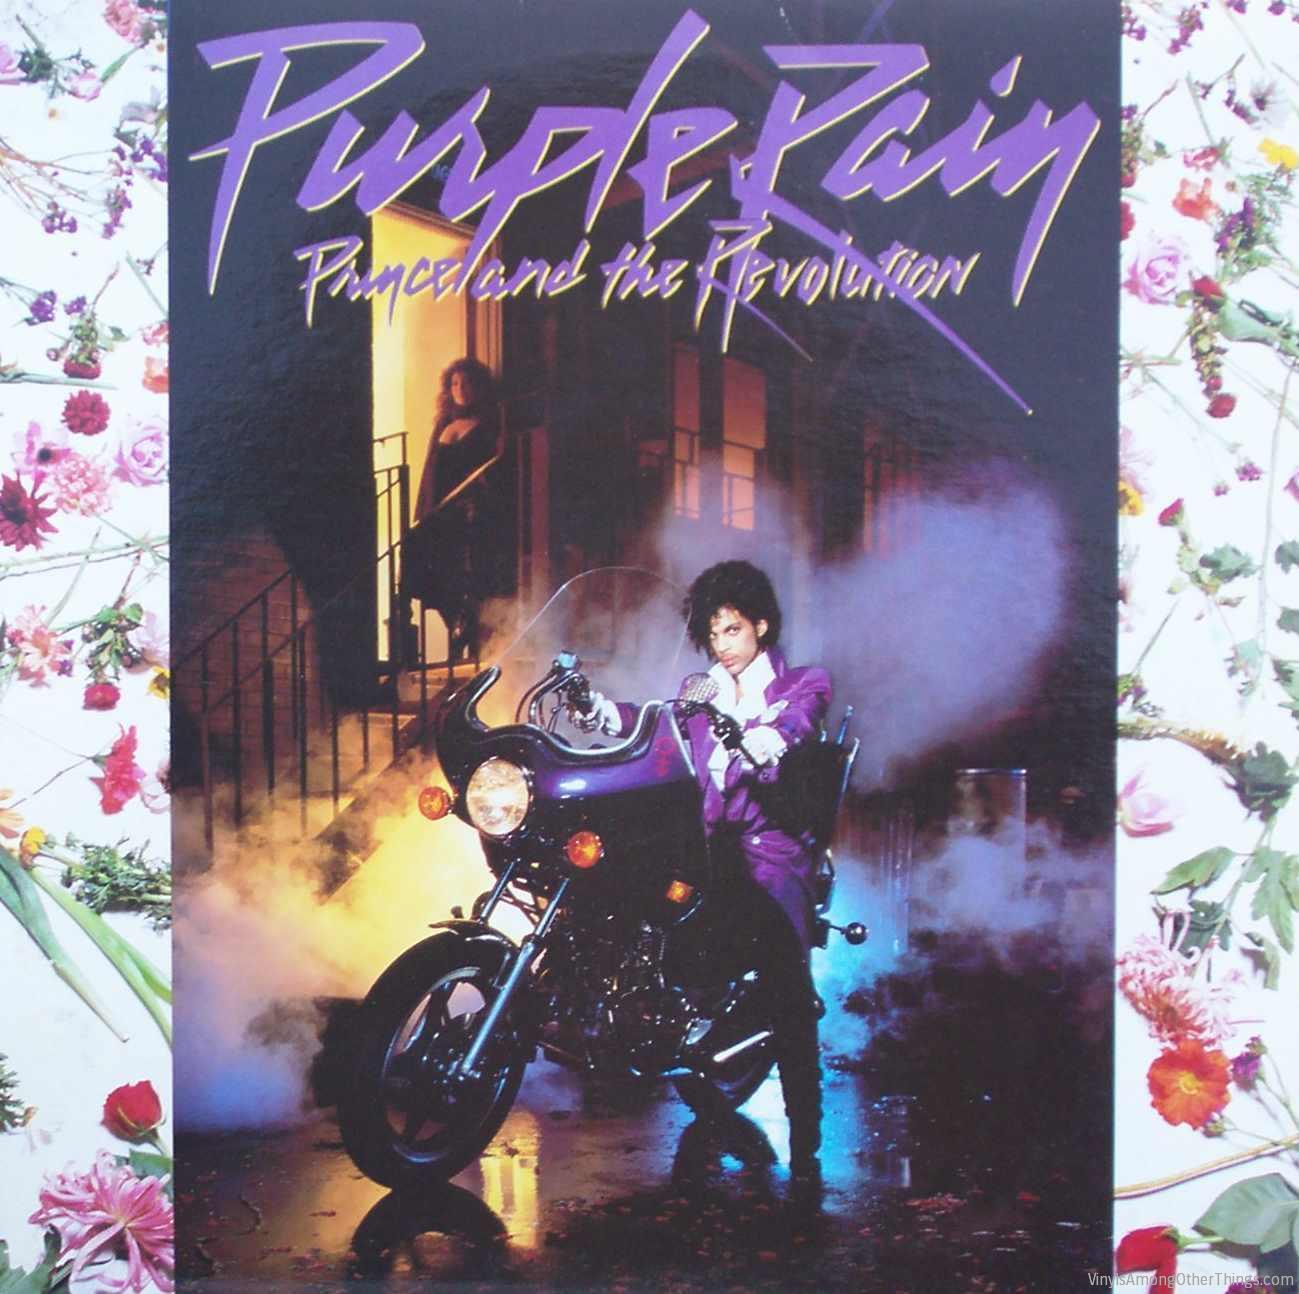 Prince 25.04.2016ANDREW